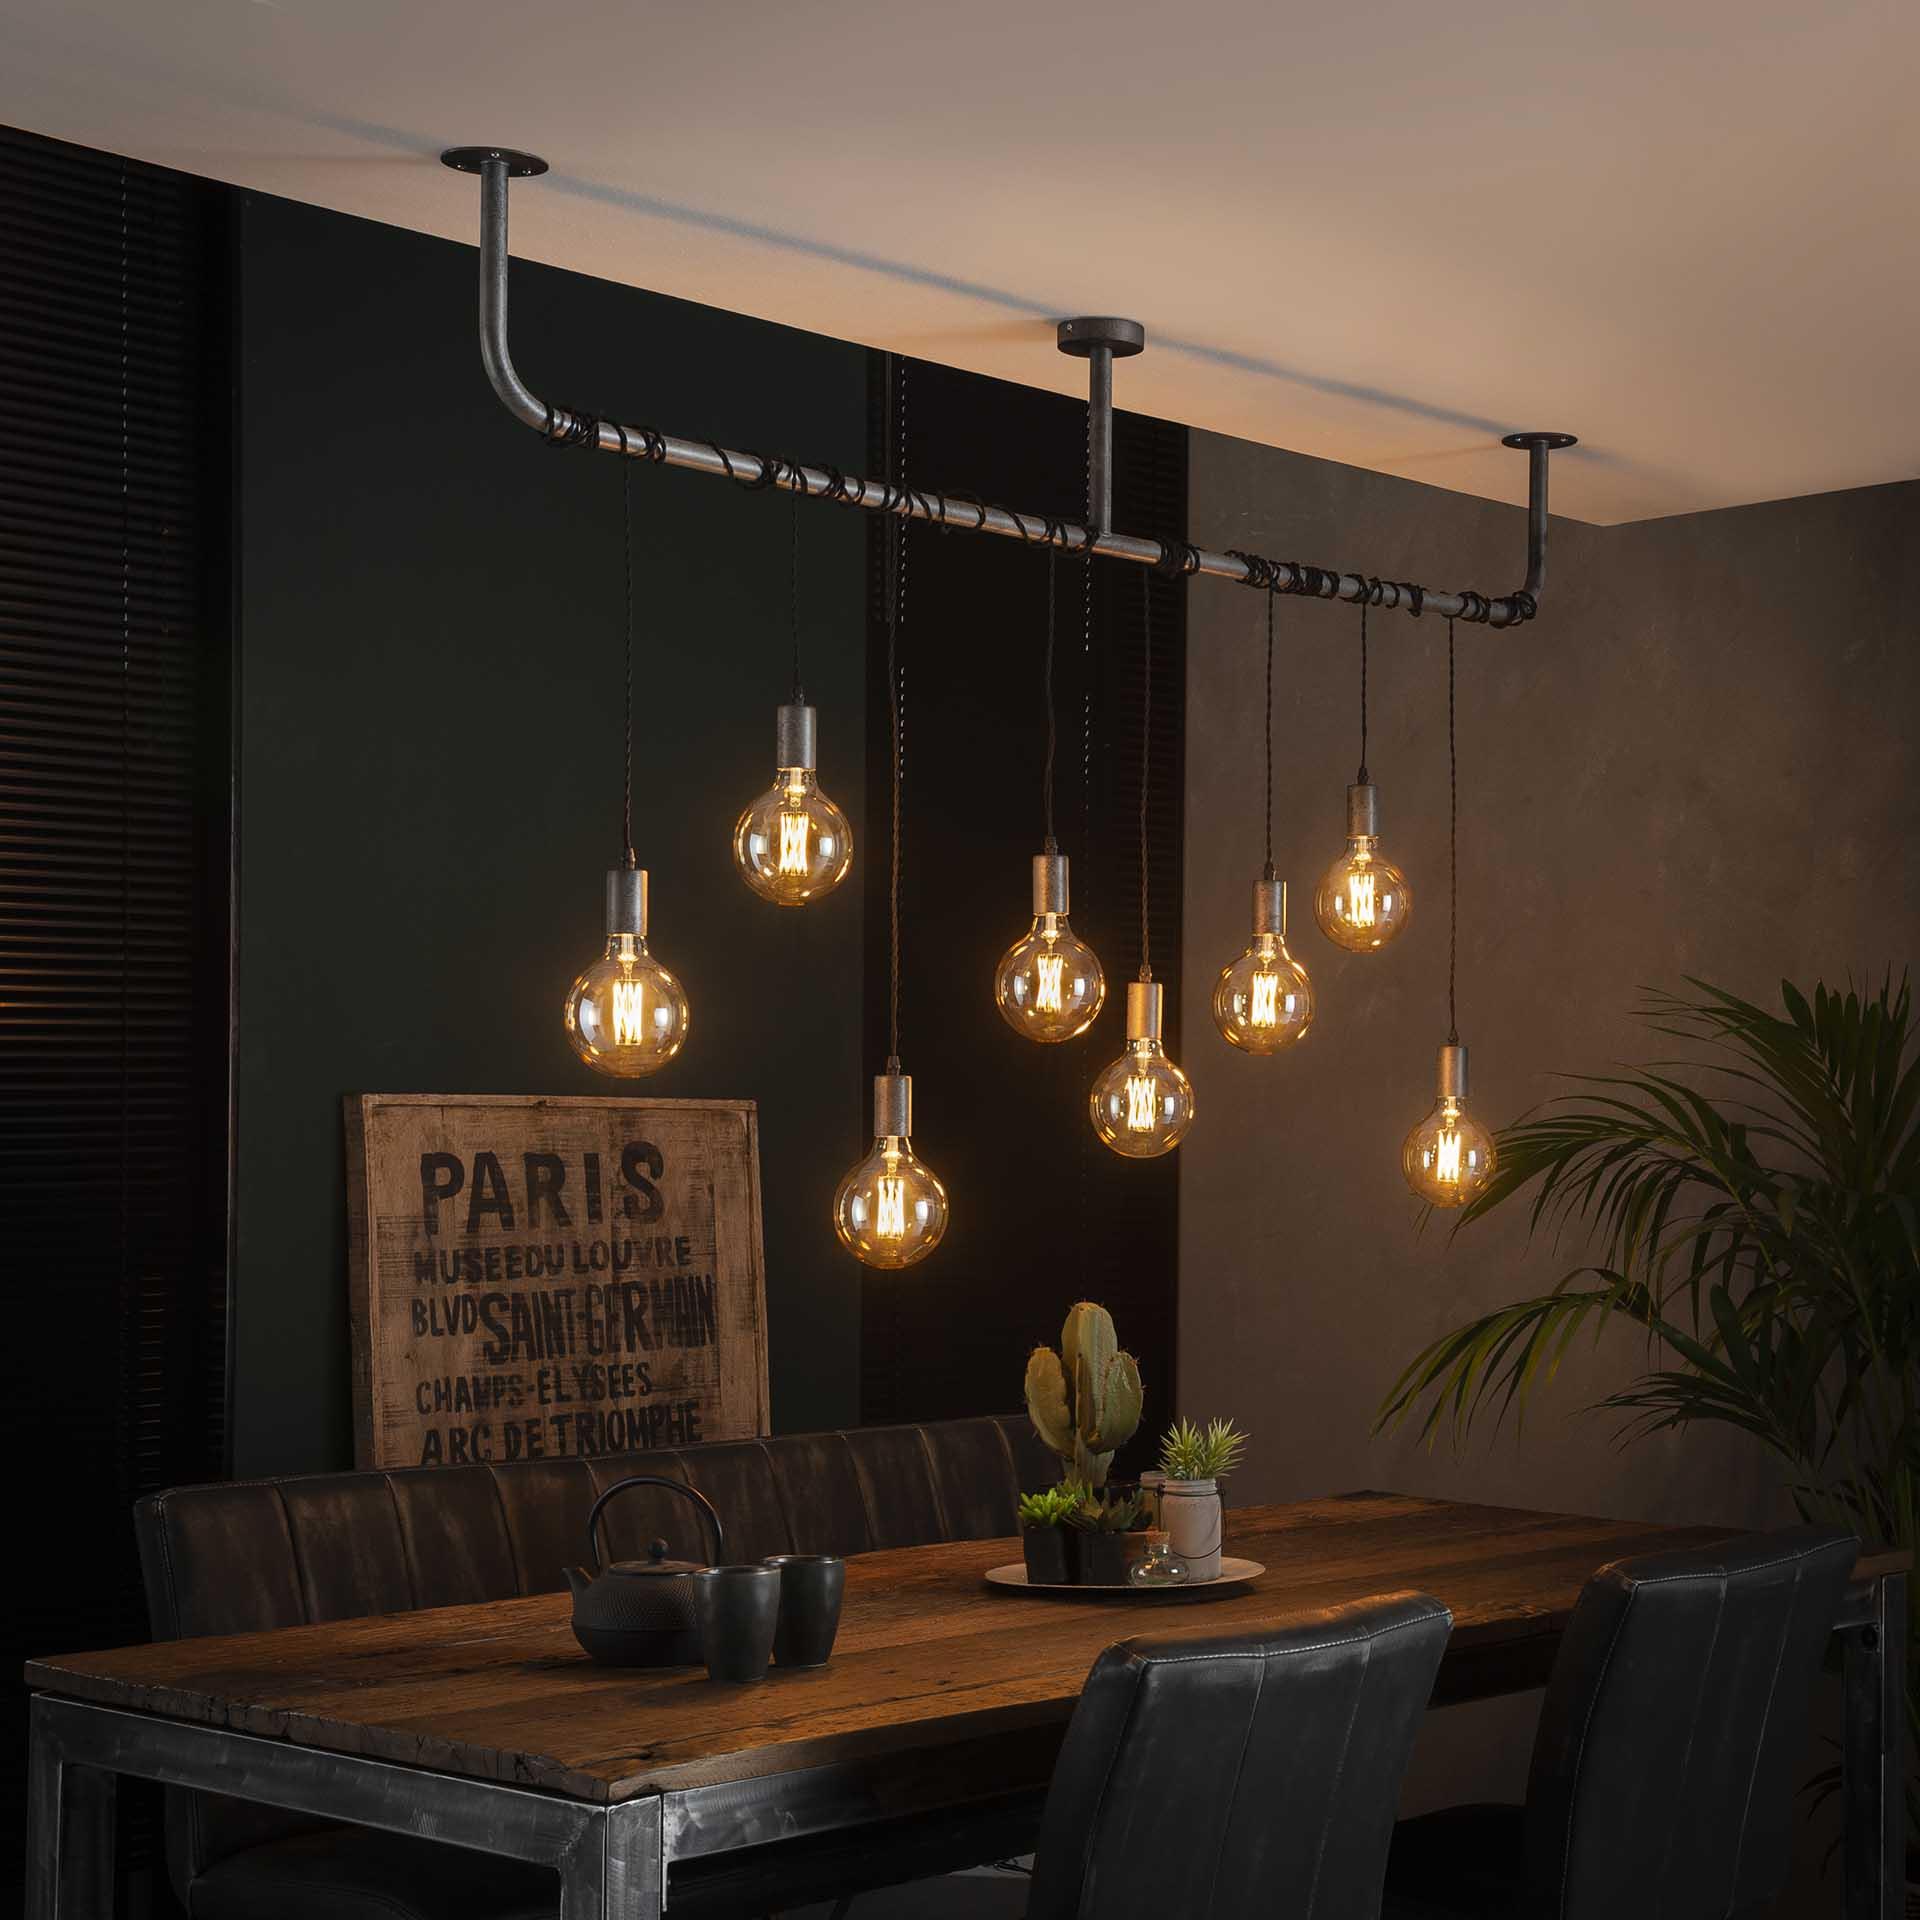 Hanglamp 8L wikkel - Oud zilver